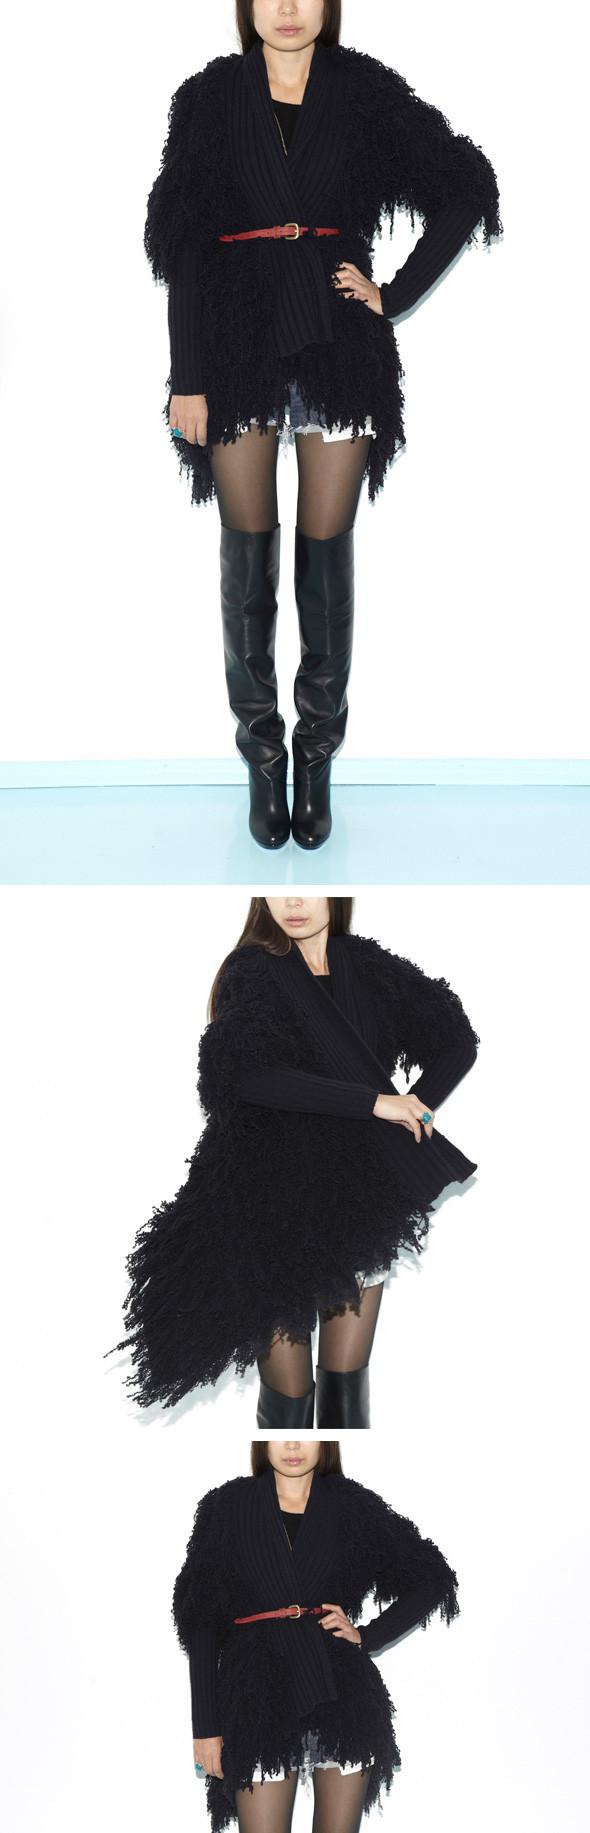 Гардероб: Джига Санжиева, младший редактор моды журнала In Style. Изображение № 15.